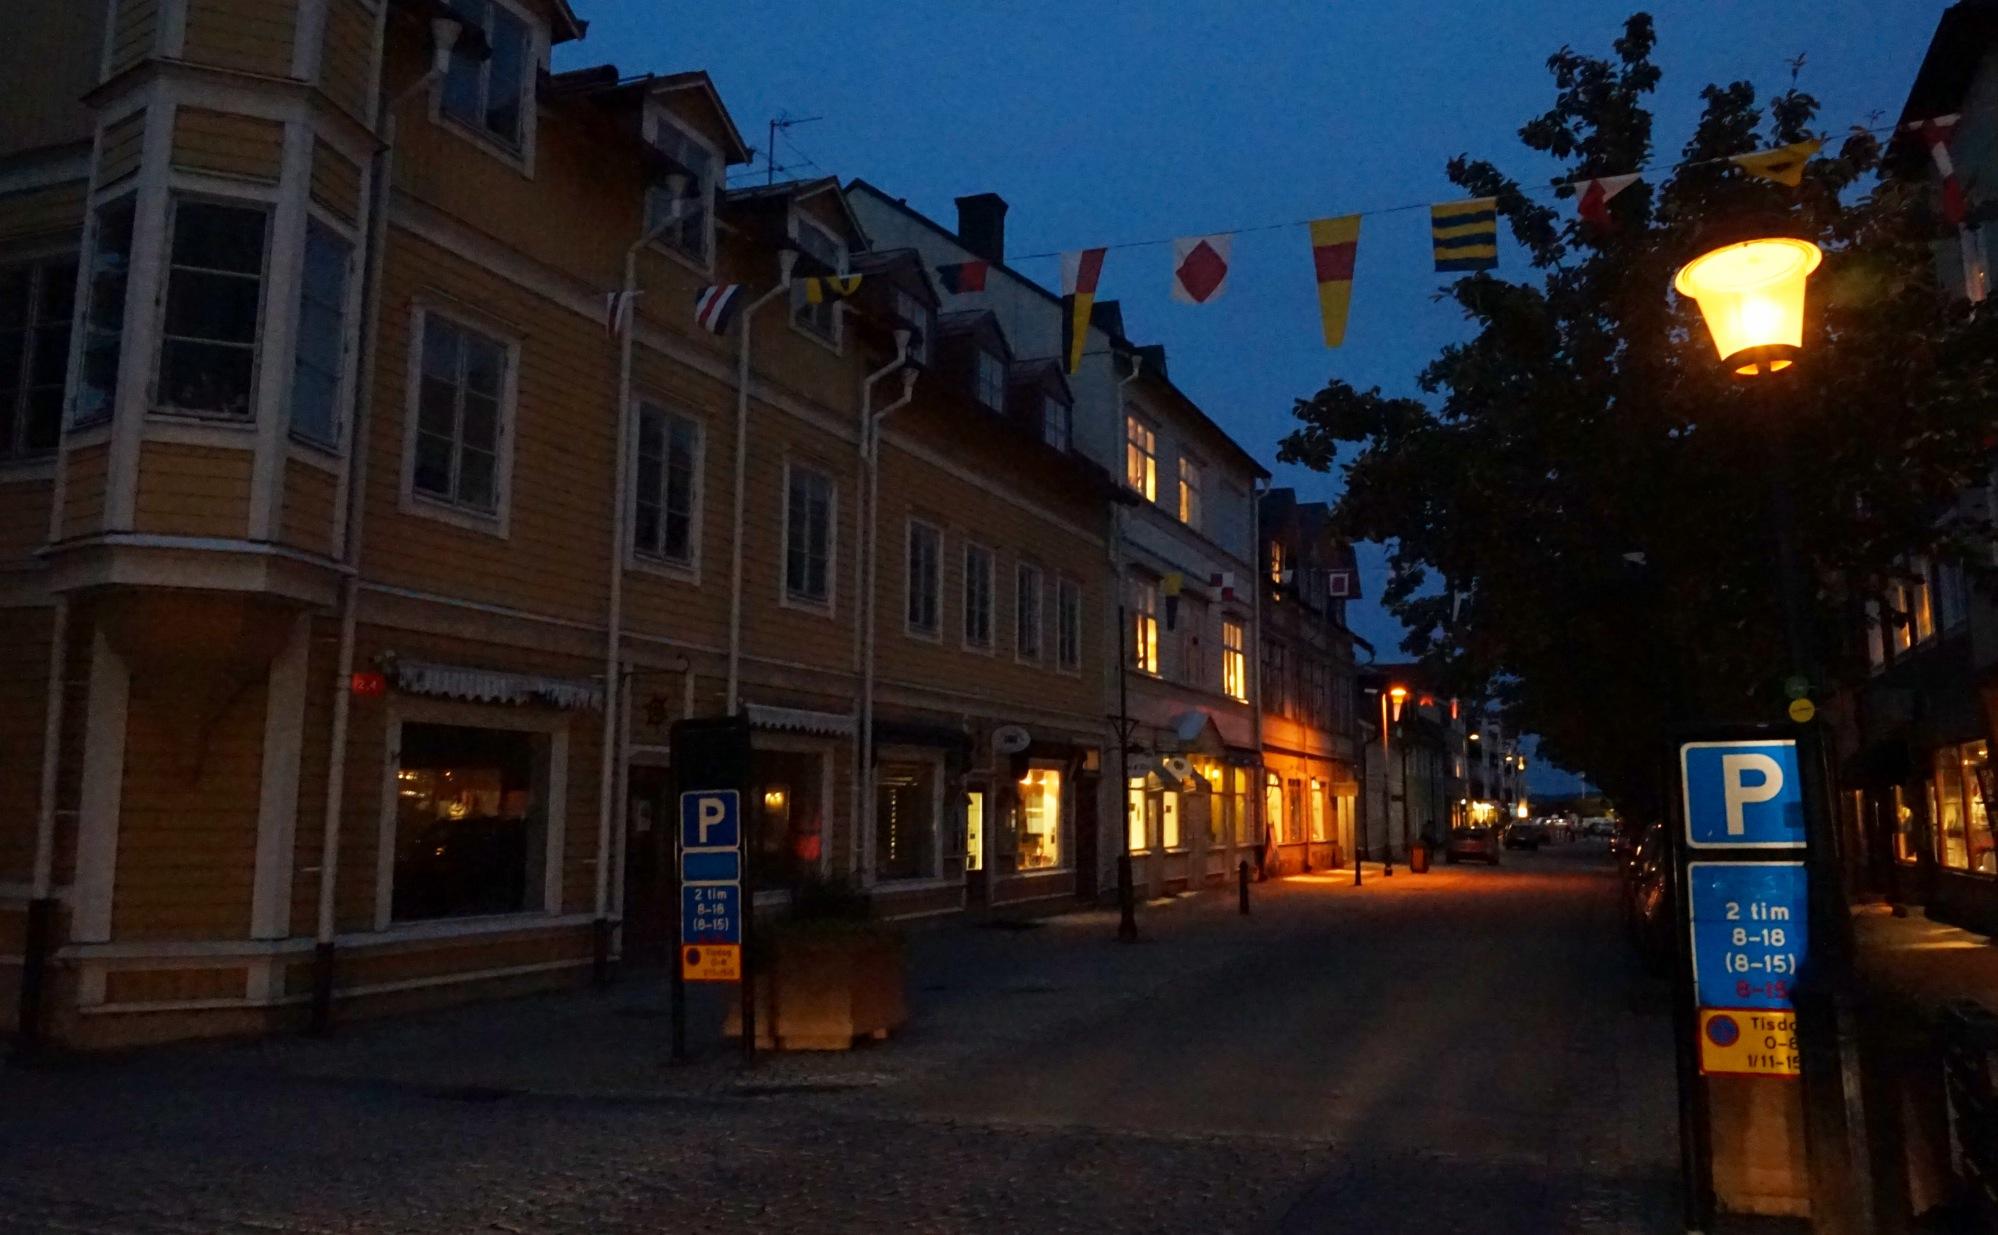 3-jours-a-stockholm-84